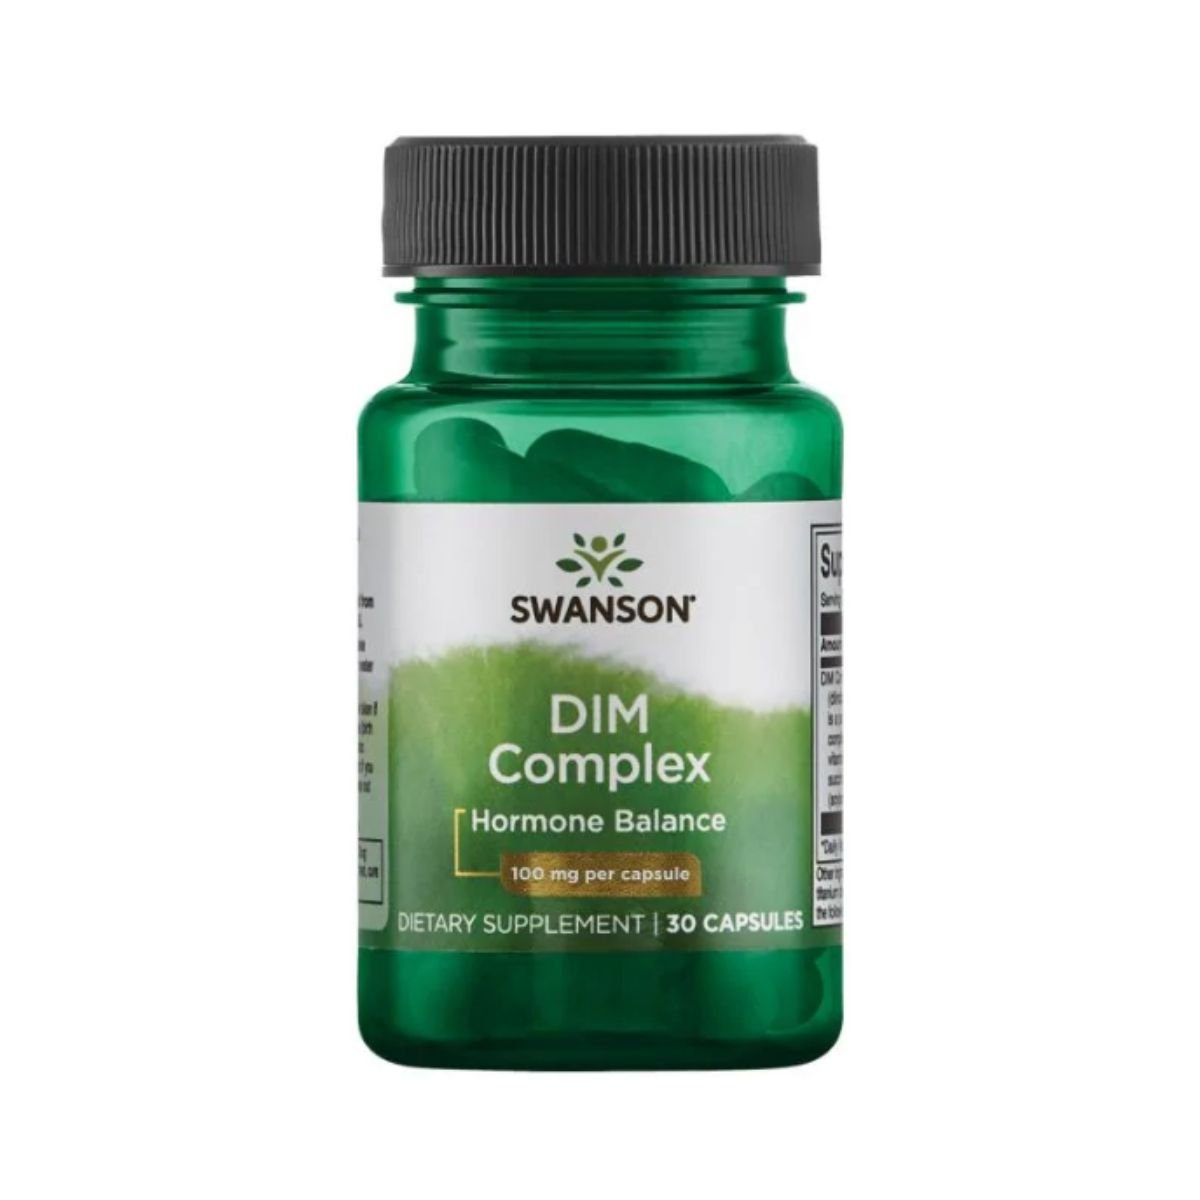 Swanson Dim Complex 100 Mg